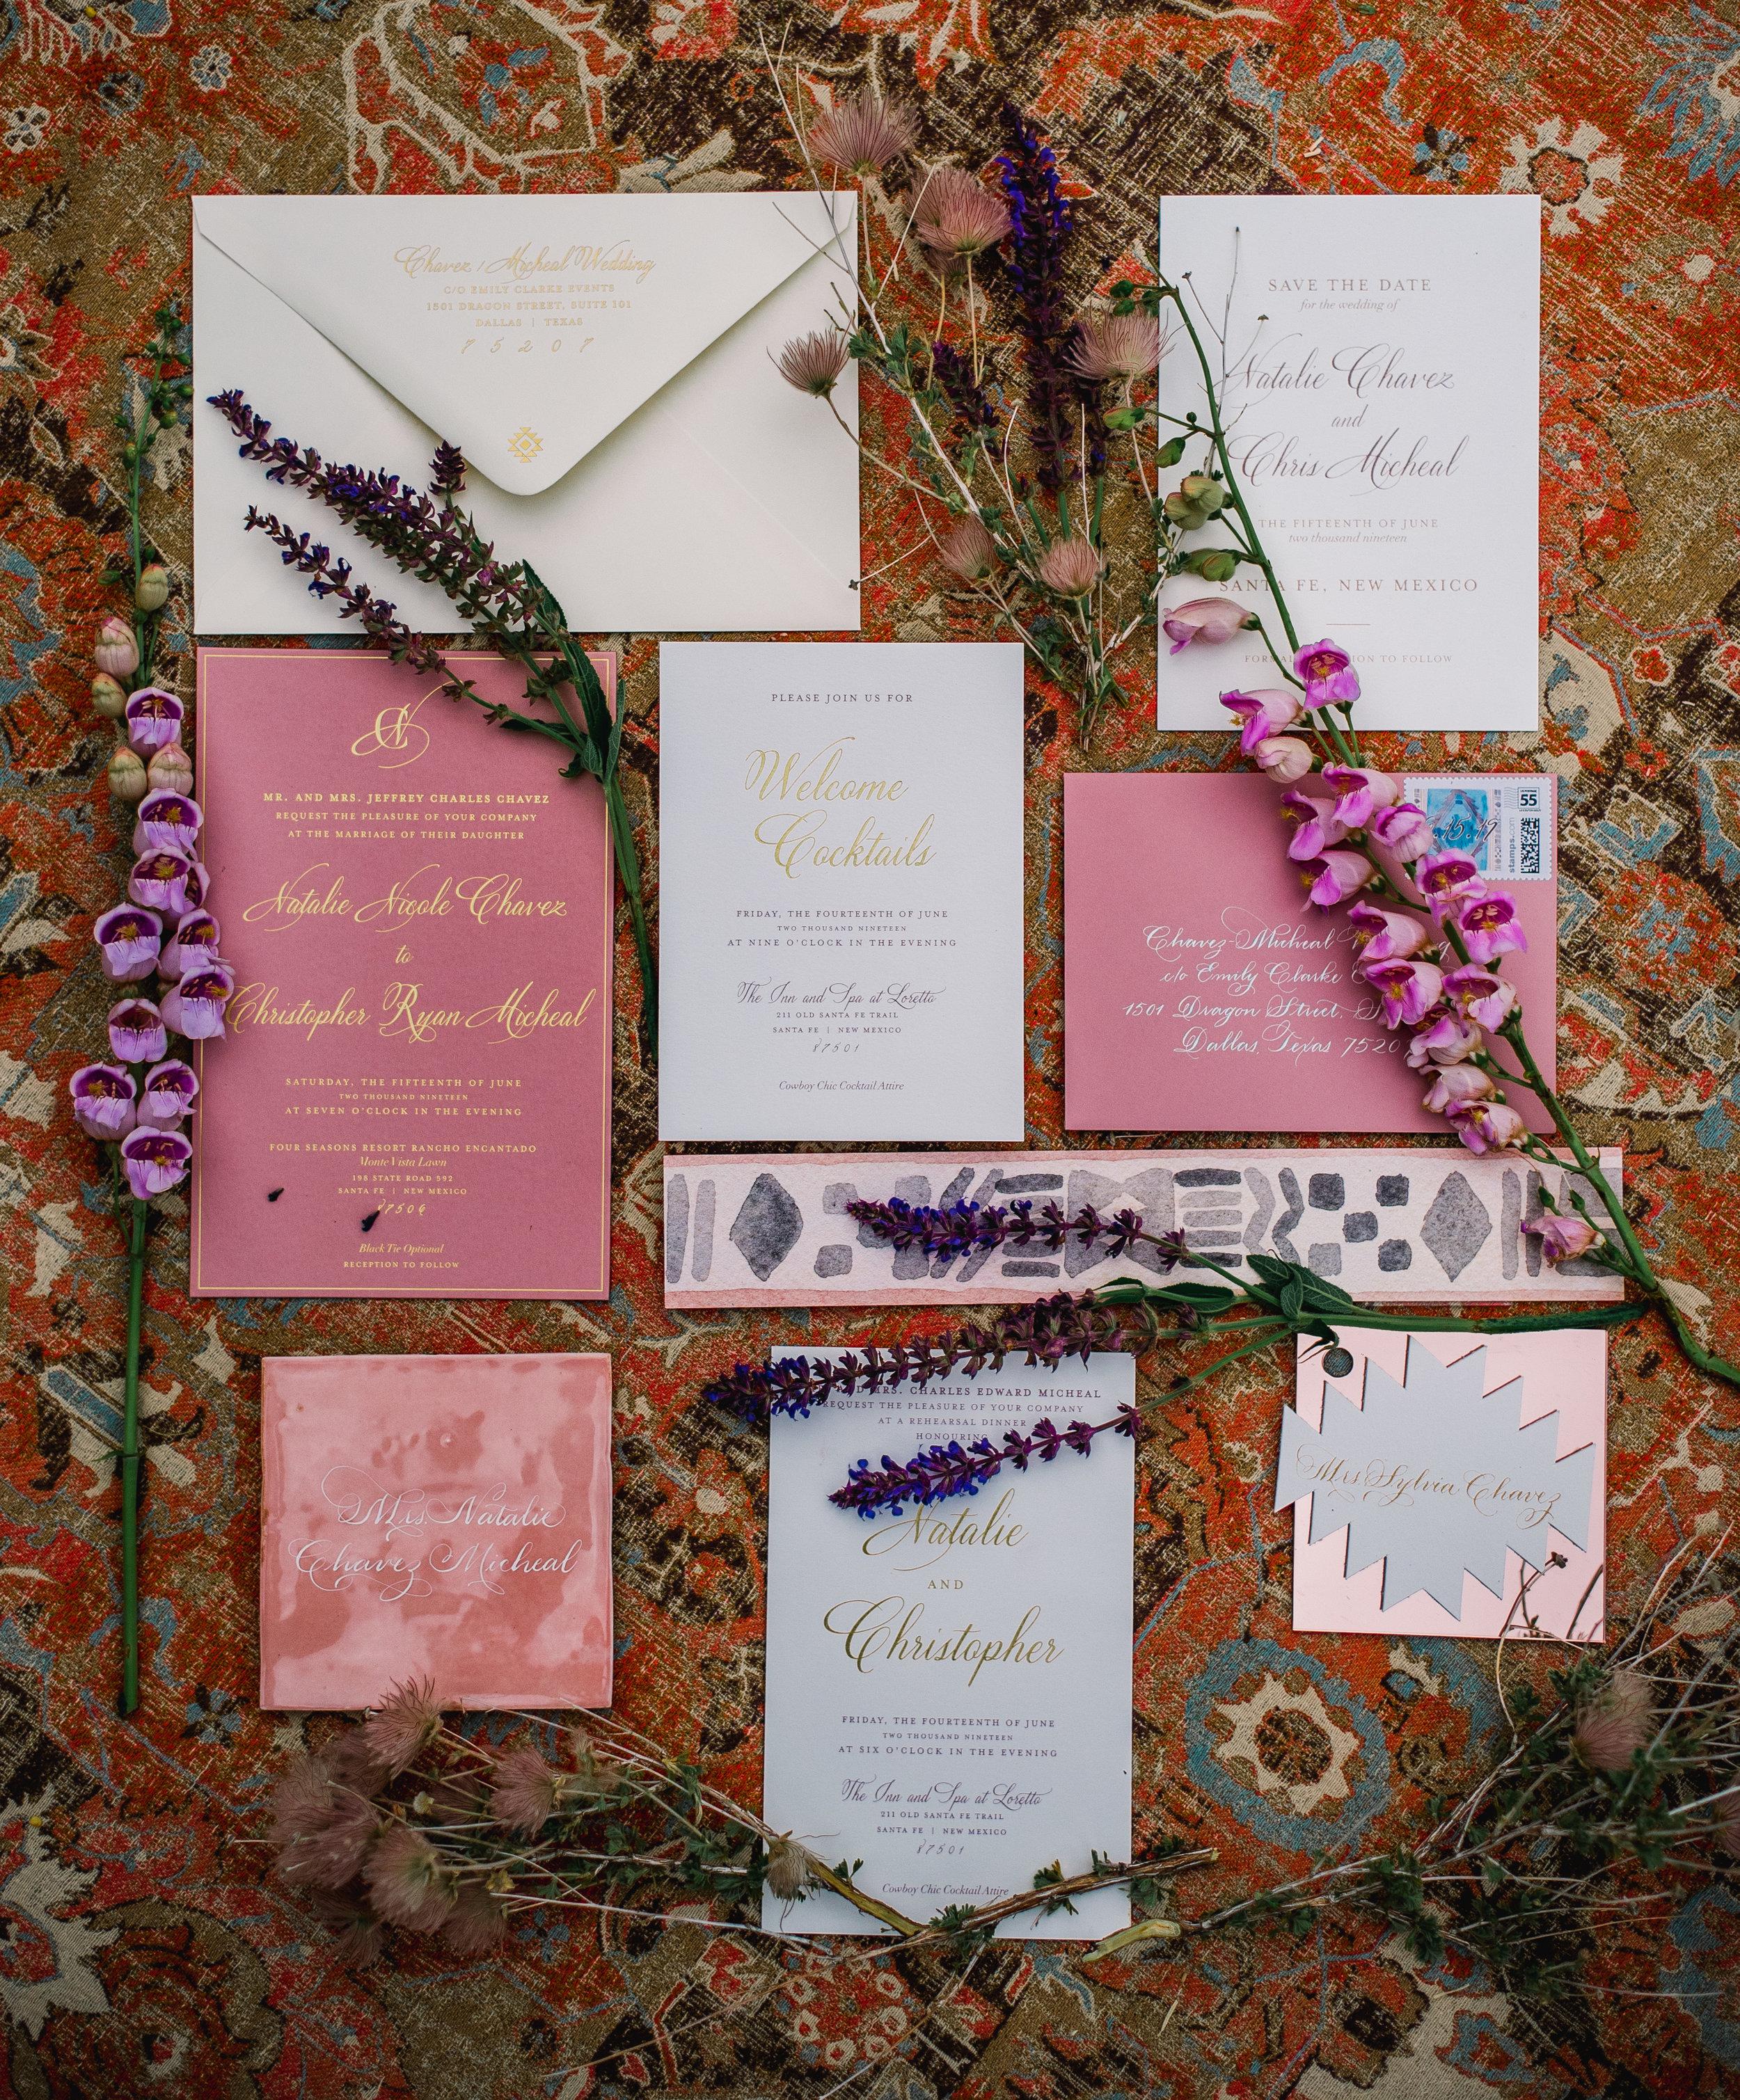 Stationery Details - Santa Fe, New Mexico - Summer Wedding - Julian Leaver Events